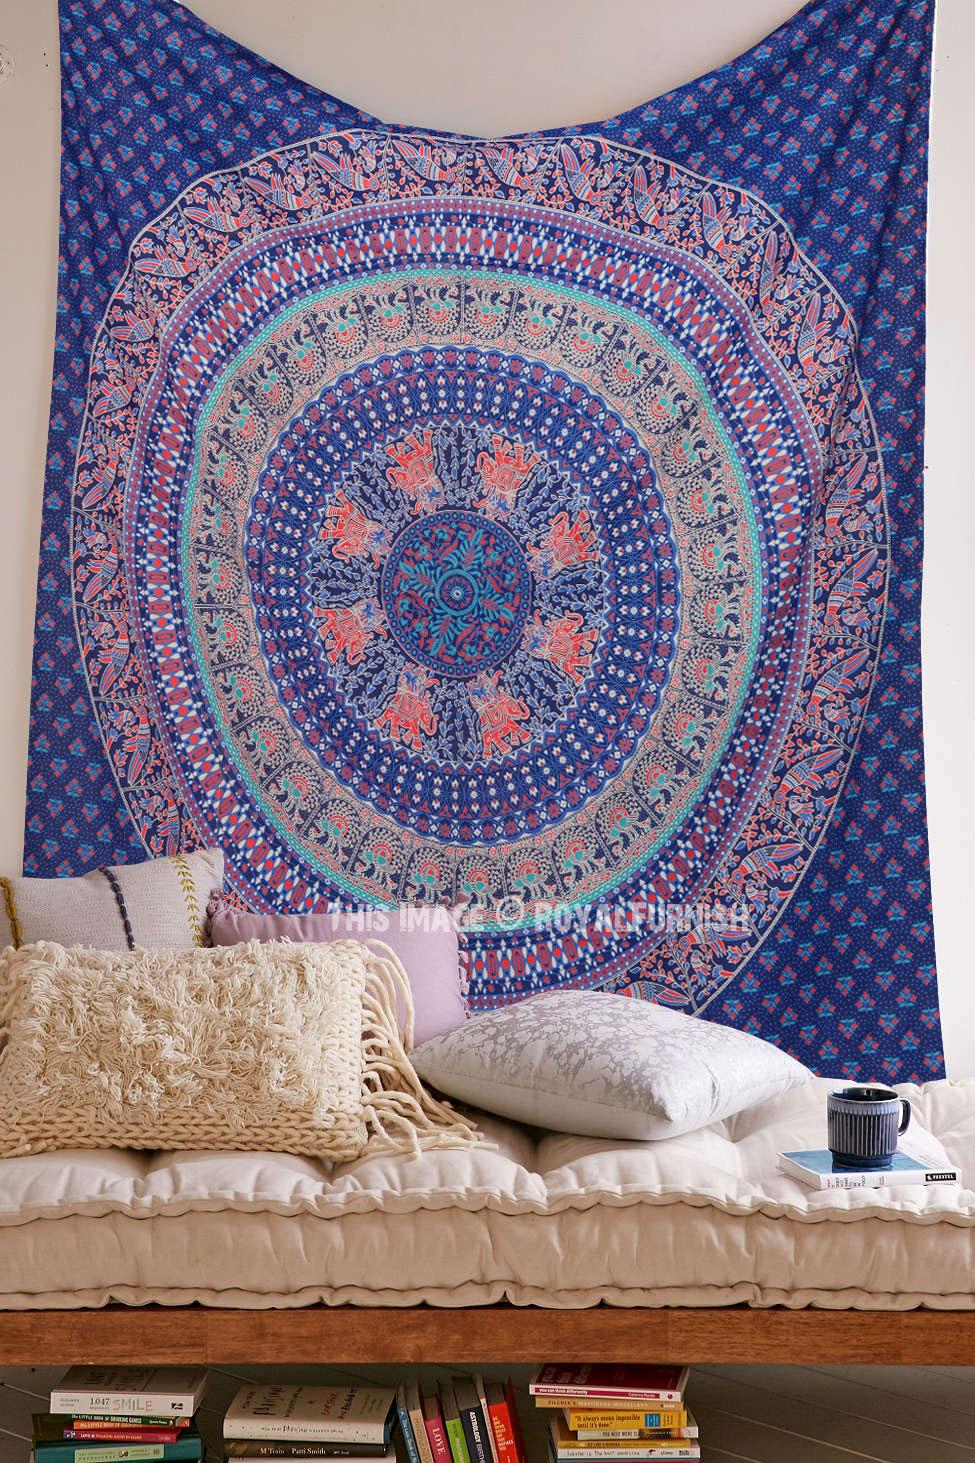 Blue multi elephants sun ombre mandala wall tapestry royalfurnish - Blue Elephants Parrot Hippie Mandala Wall Tapestry